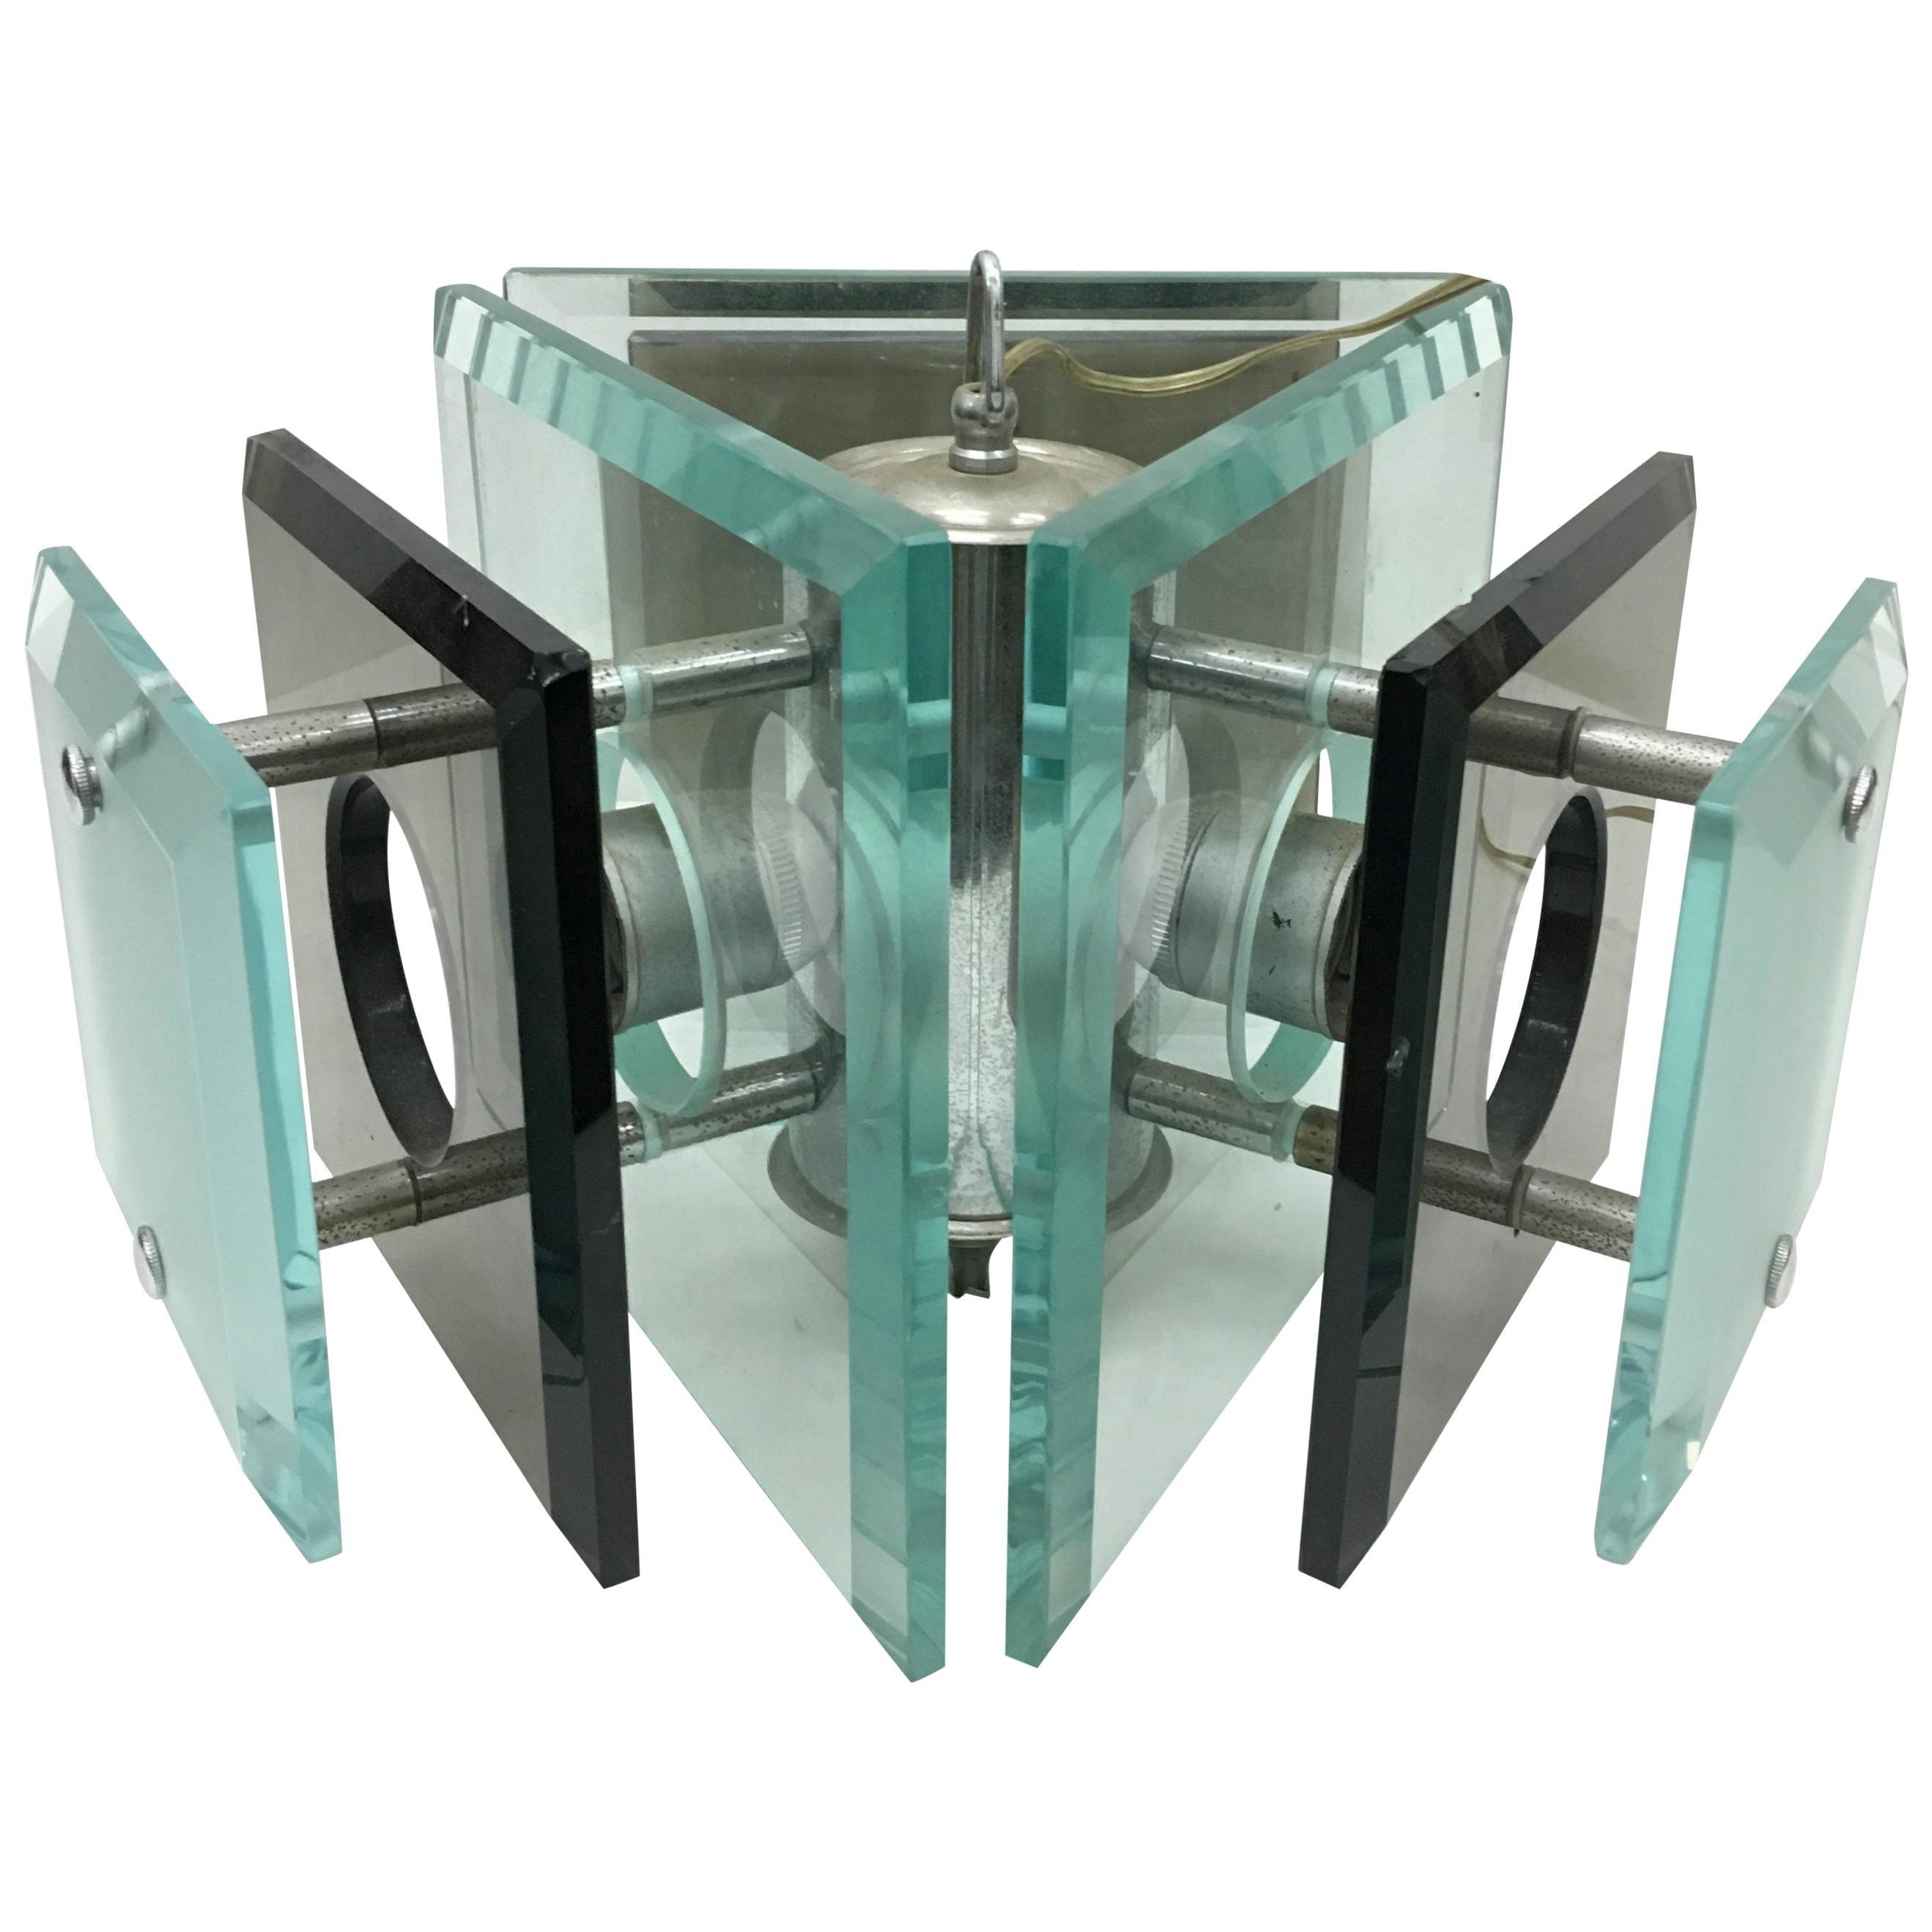 Fontana Arte Attributes Space Age Steel and Glass Italian Pendant, circa 1970